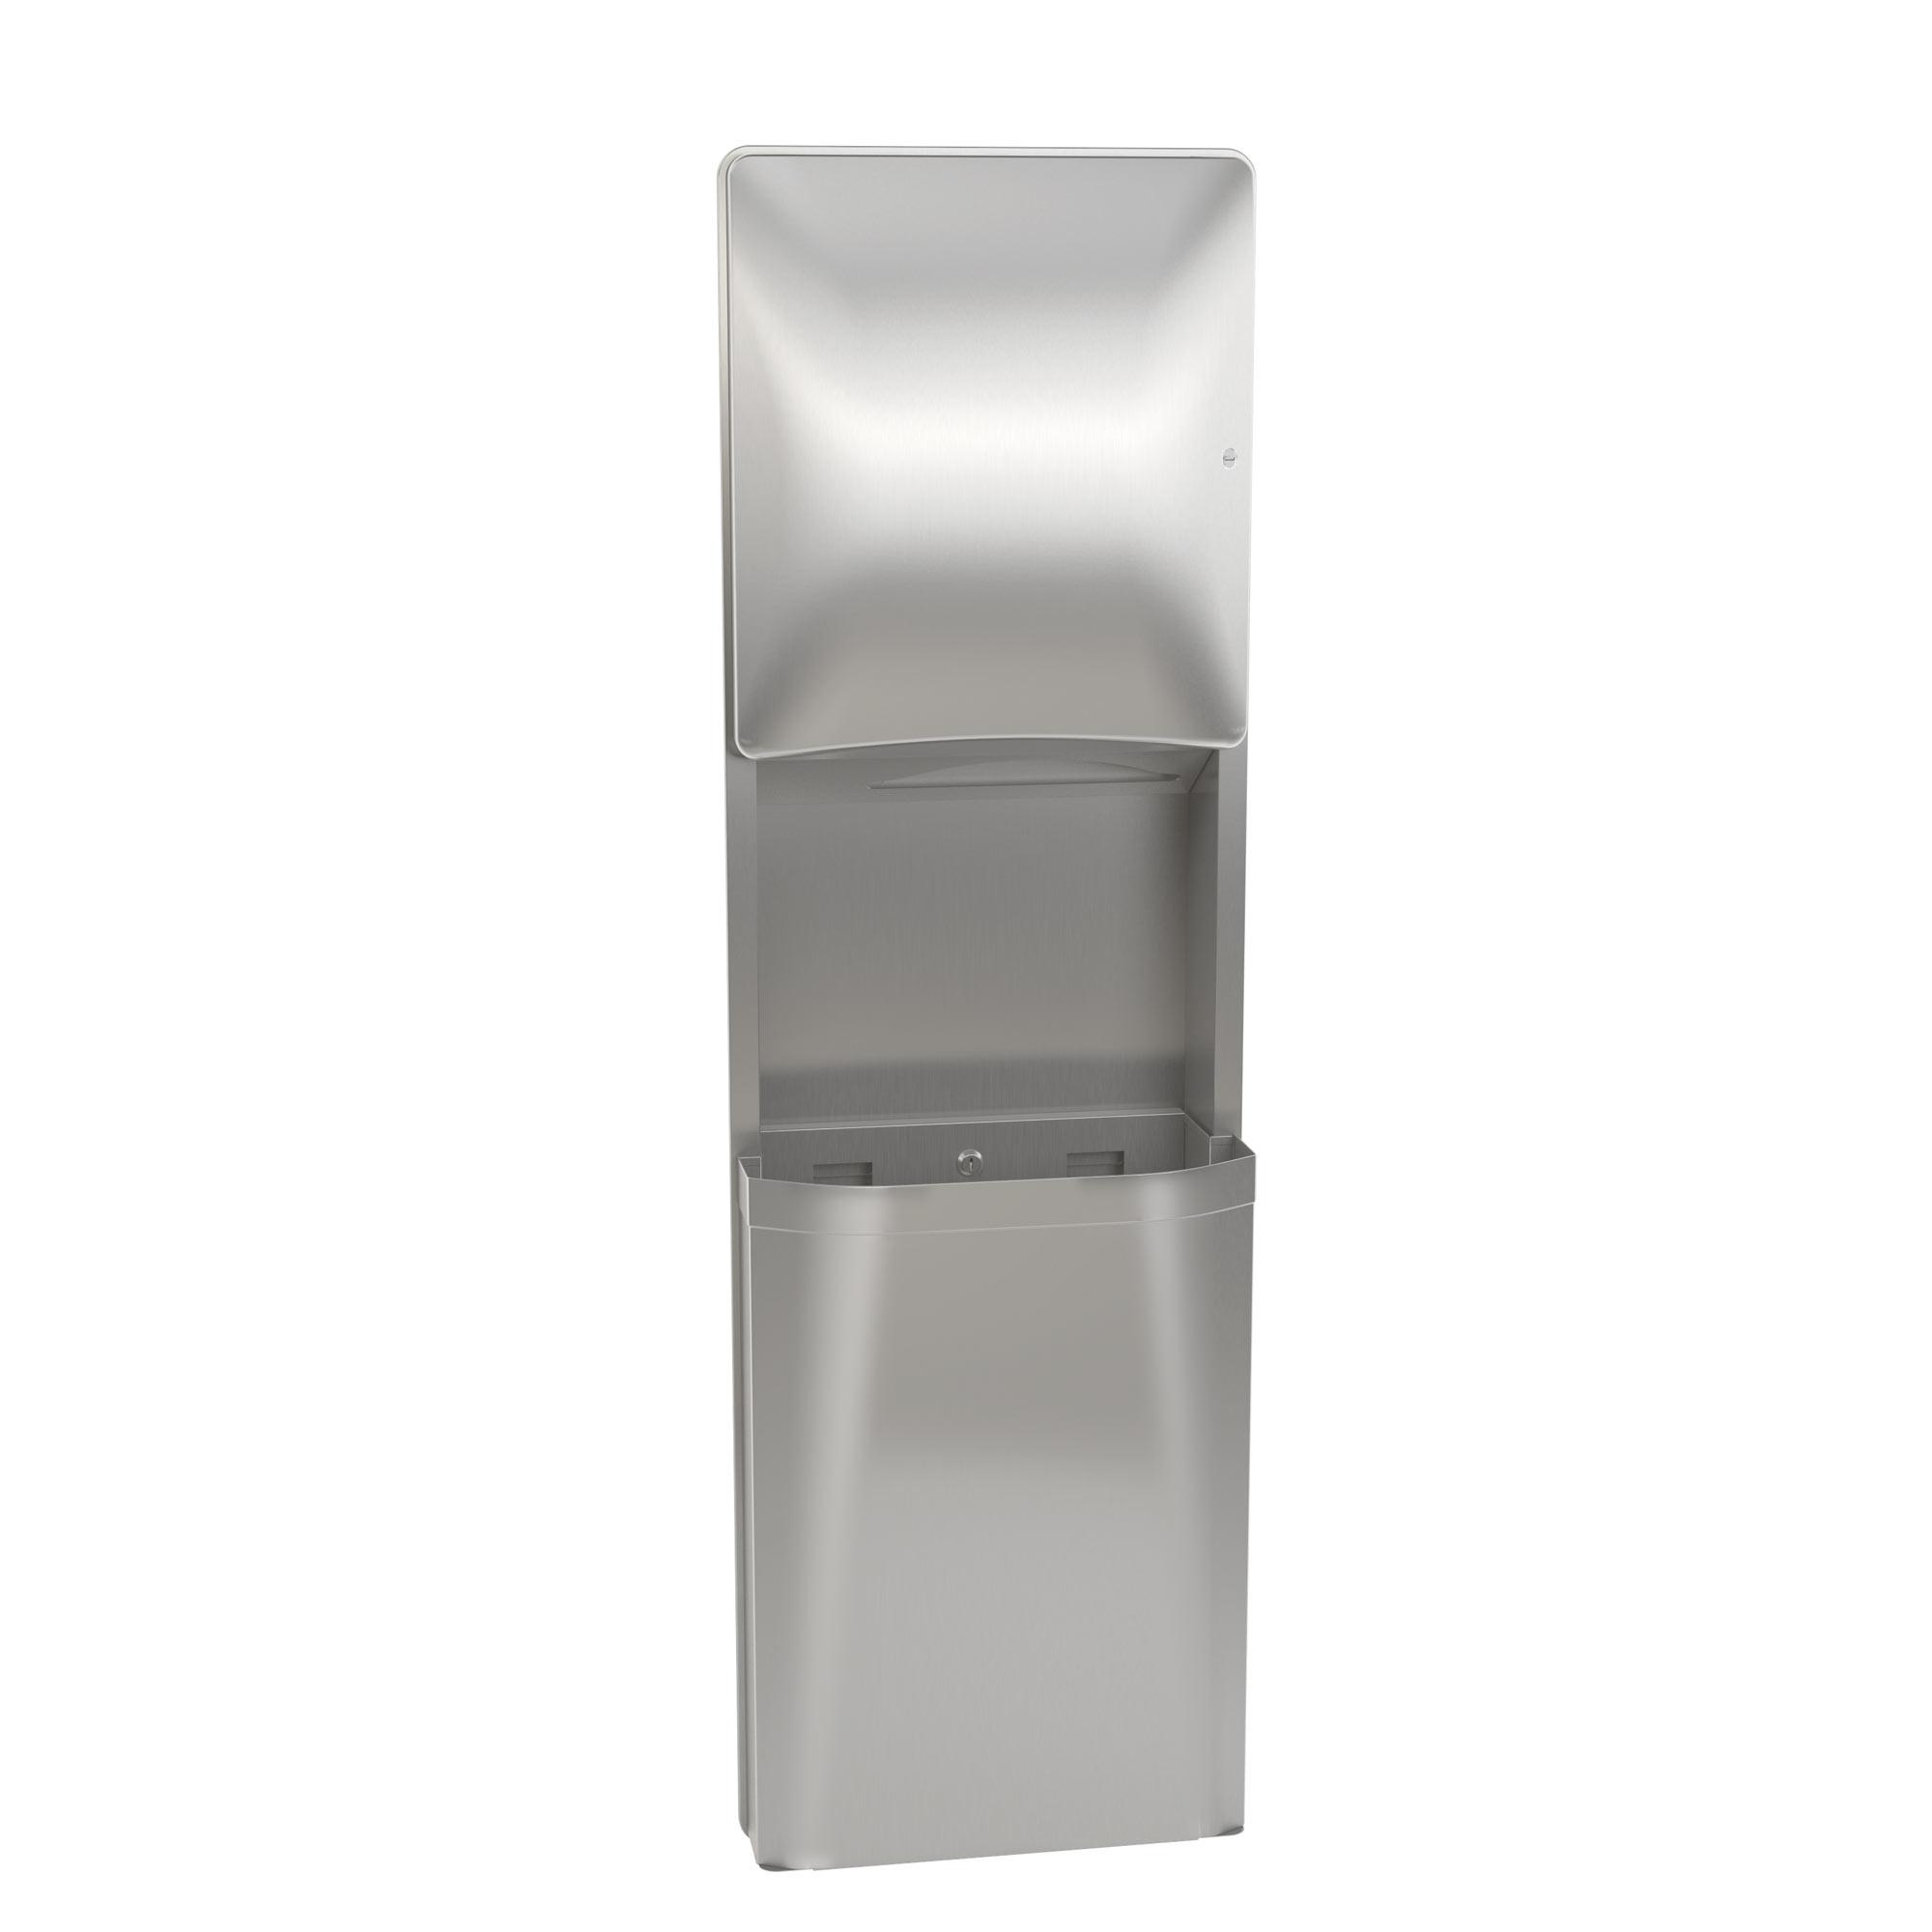 Bradley 2A05-1036 Semi-Recessed Folded Towel Dispenser & 18 gal. Waste Receptacle